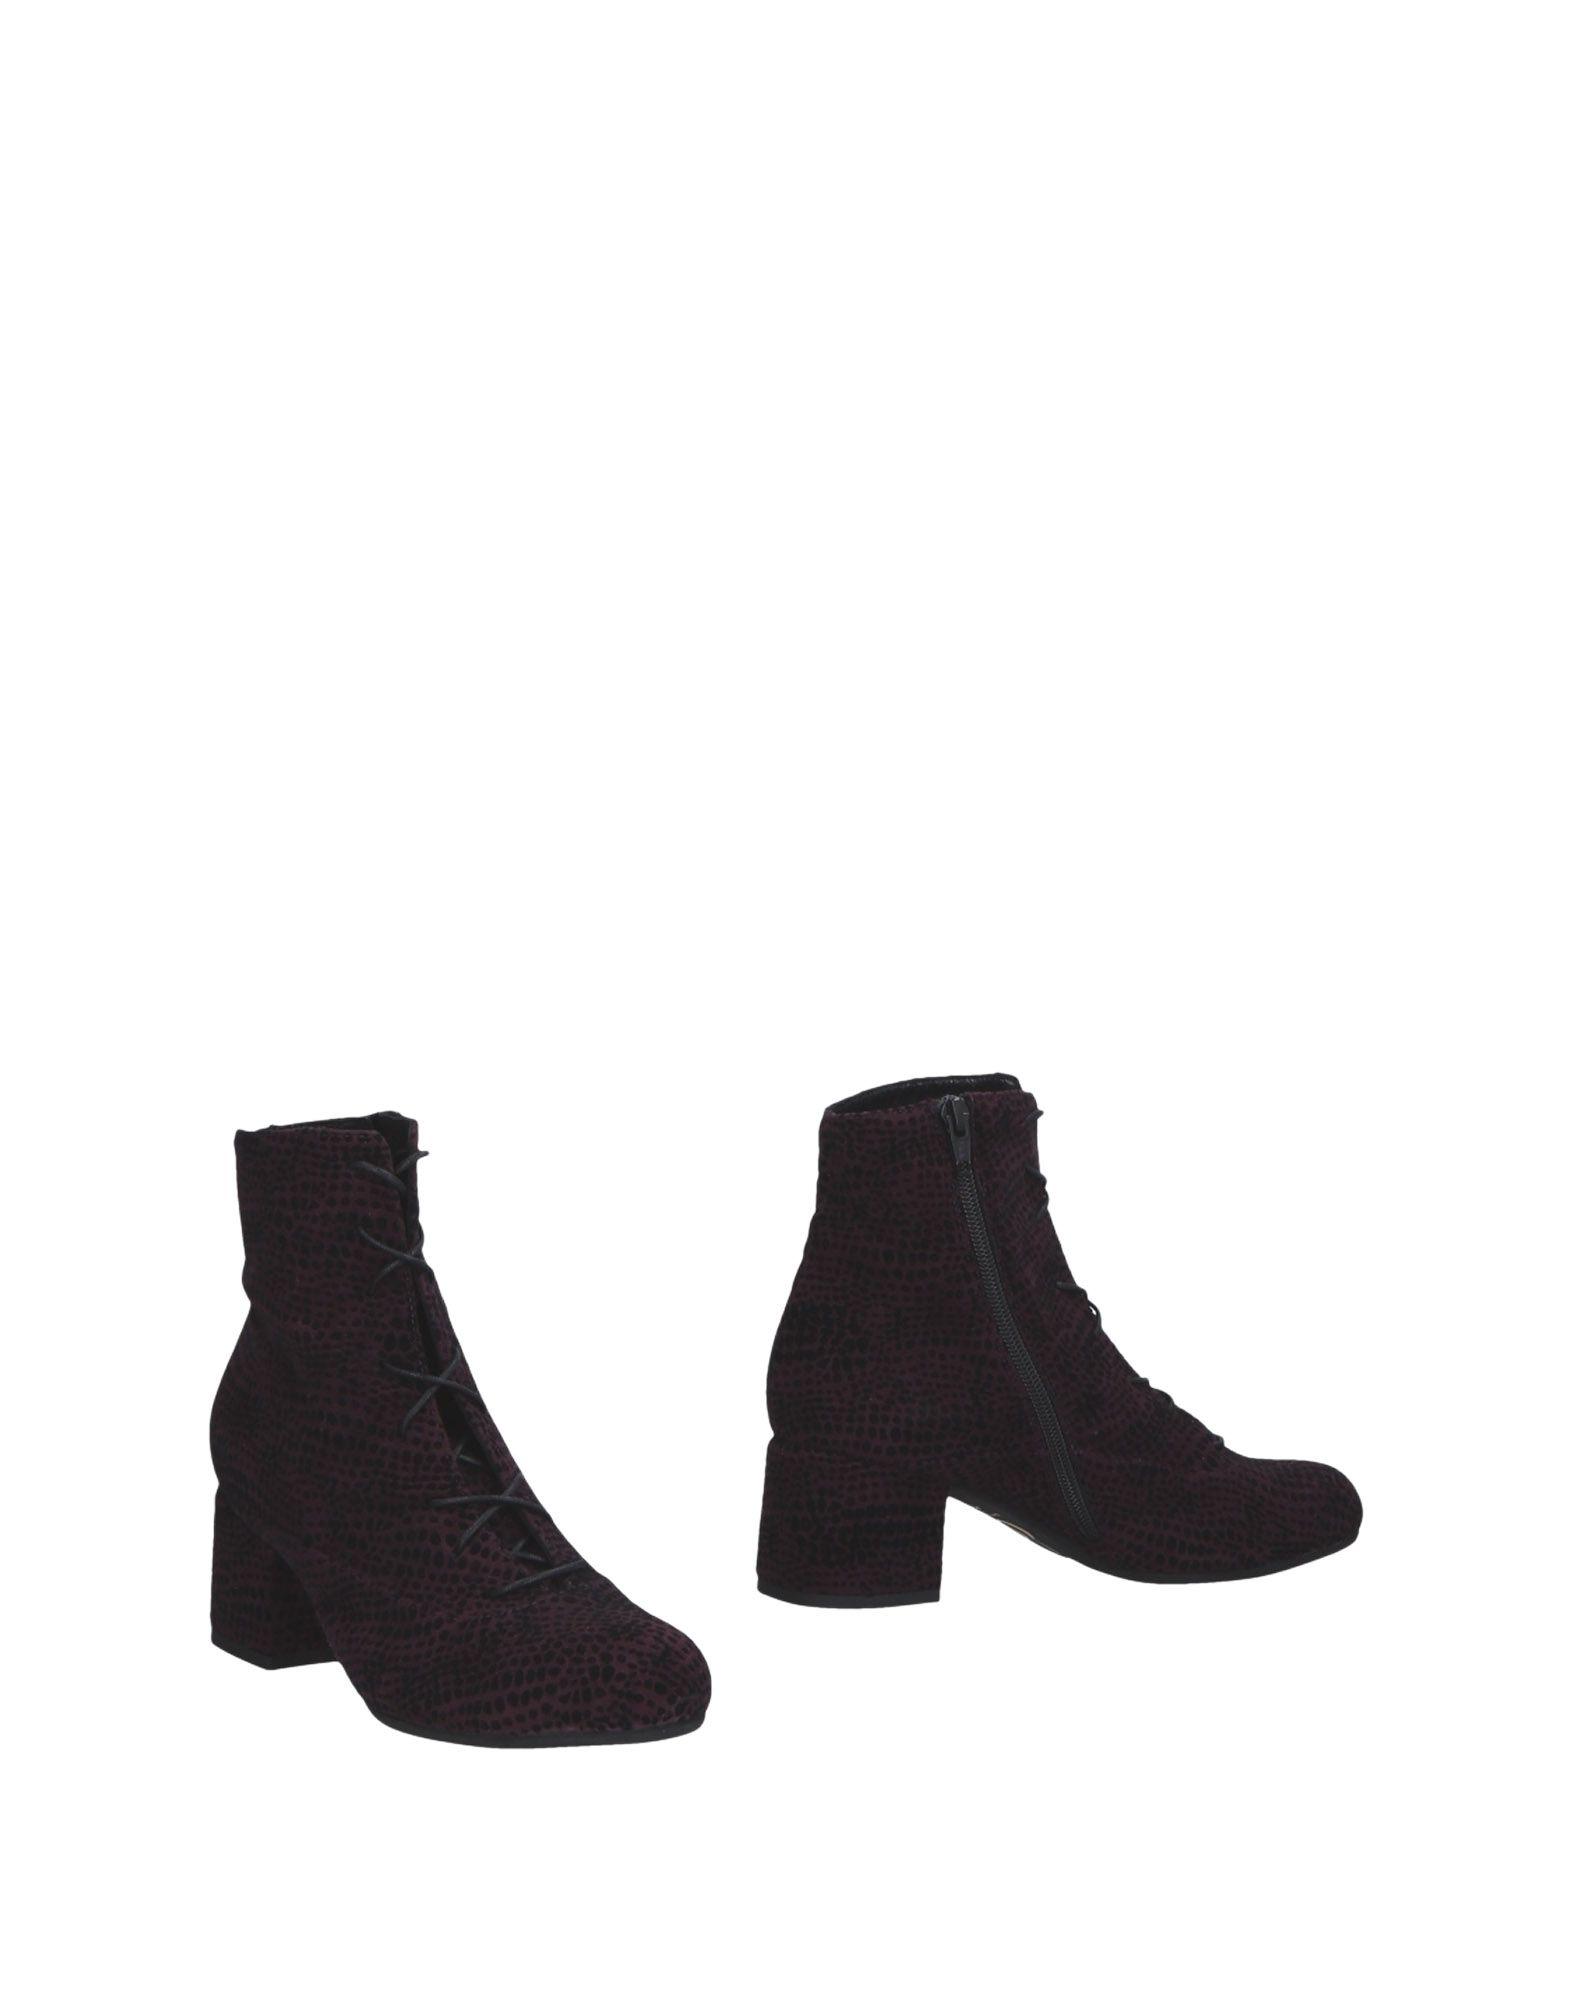 Sgn Giancarlo Paoli Stiefelette Damen  11475387AKGut aussehende strapazierfähige Schuhe